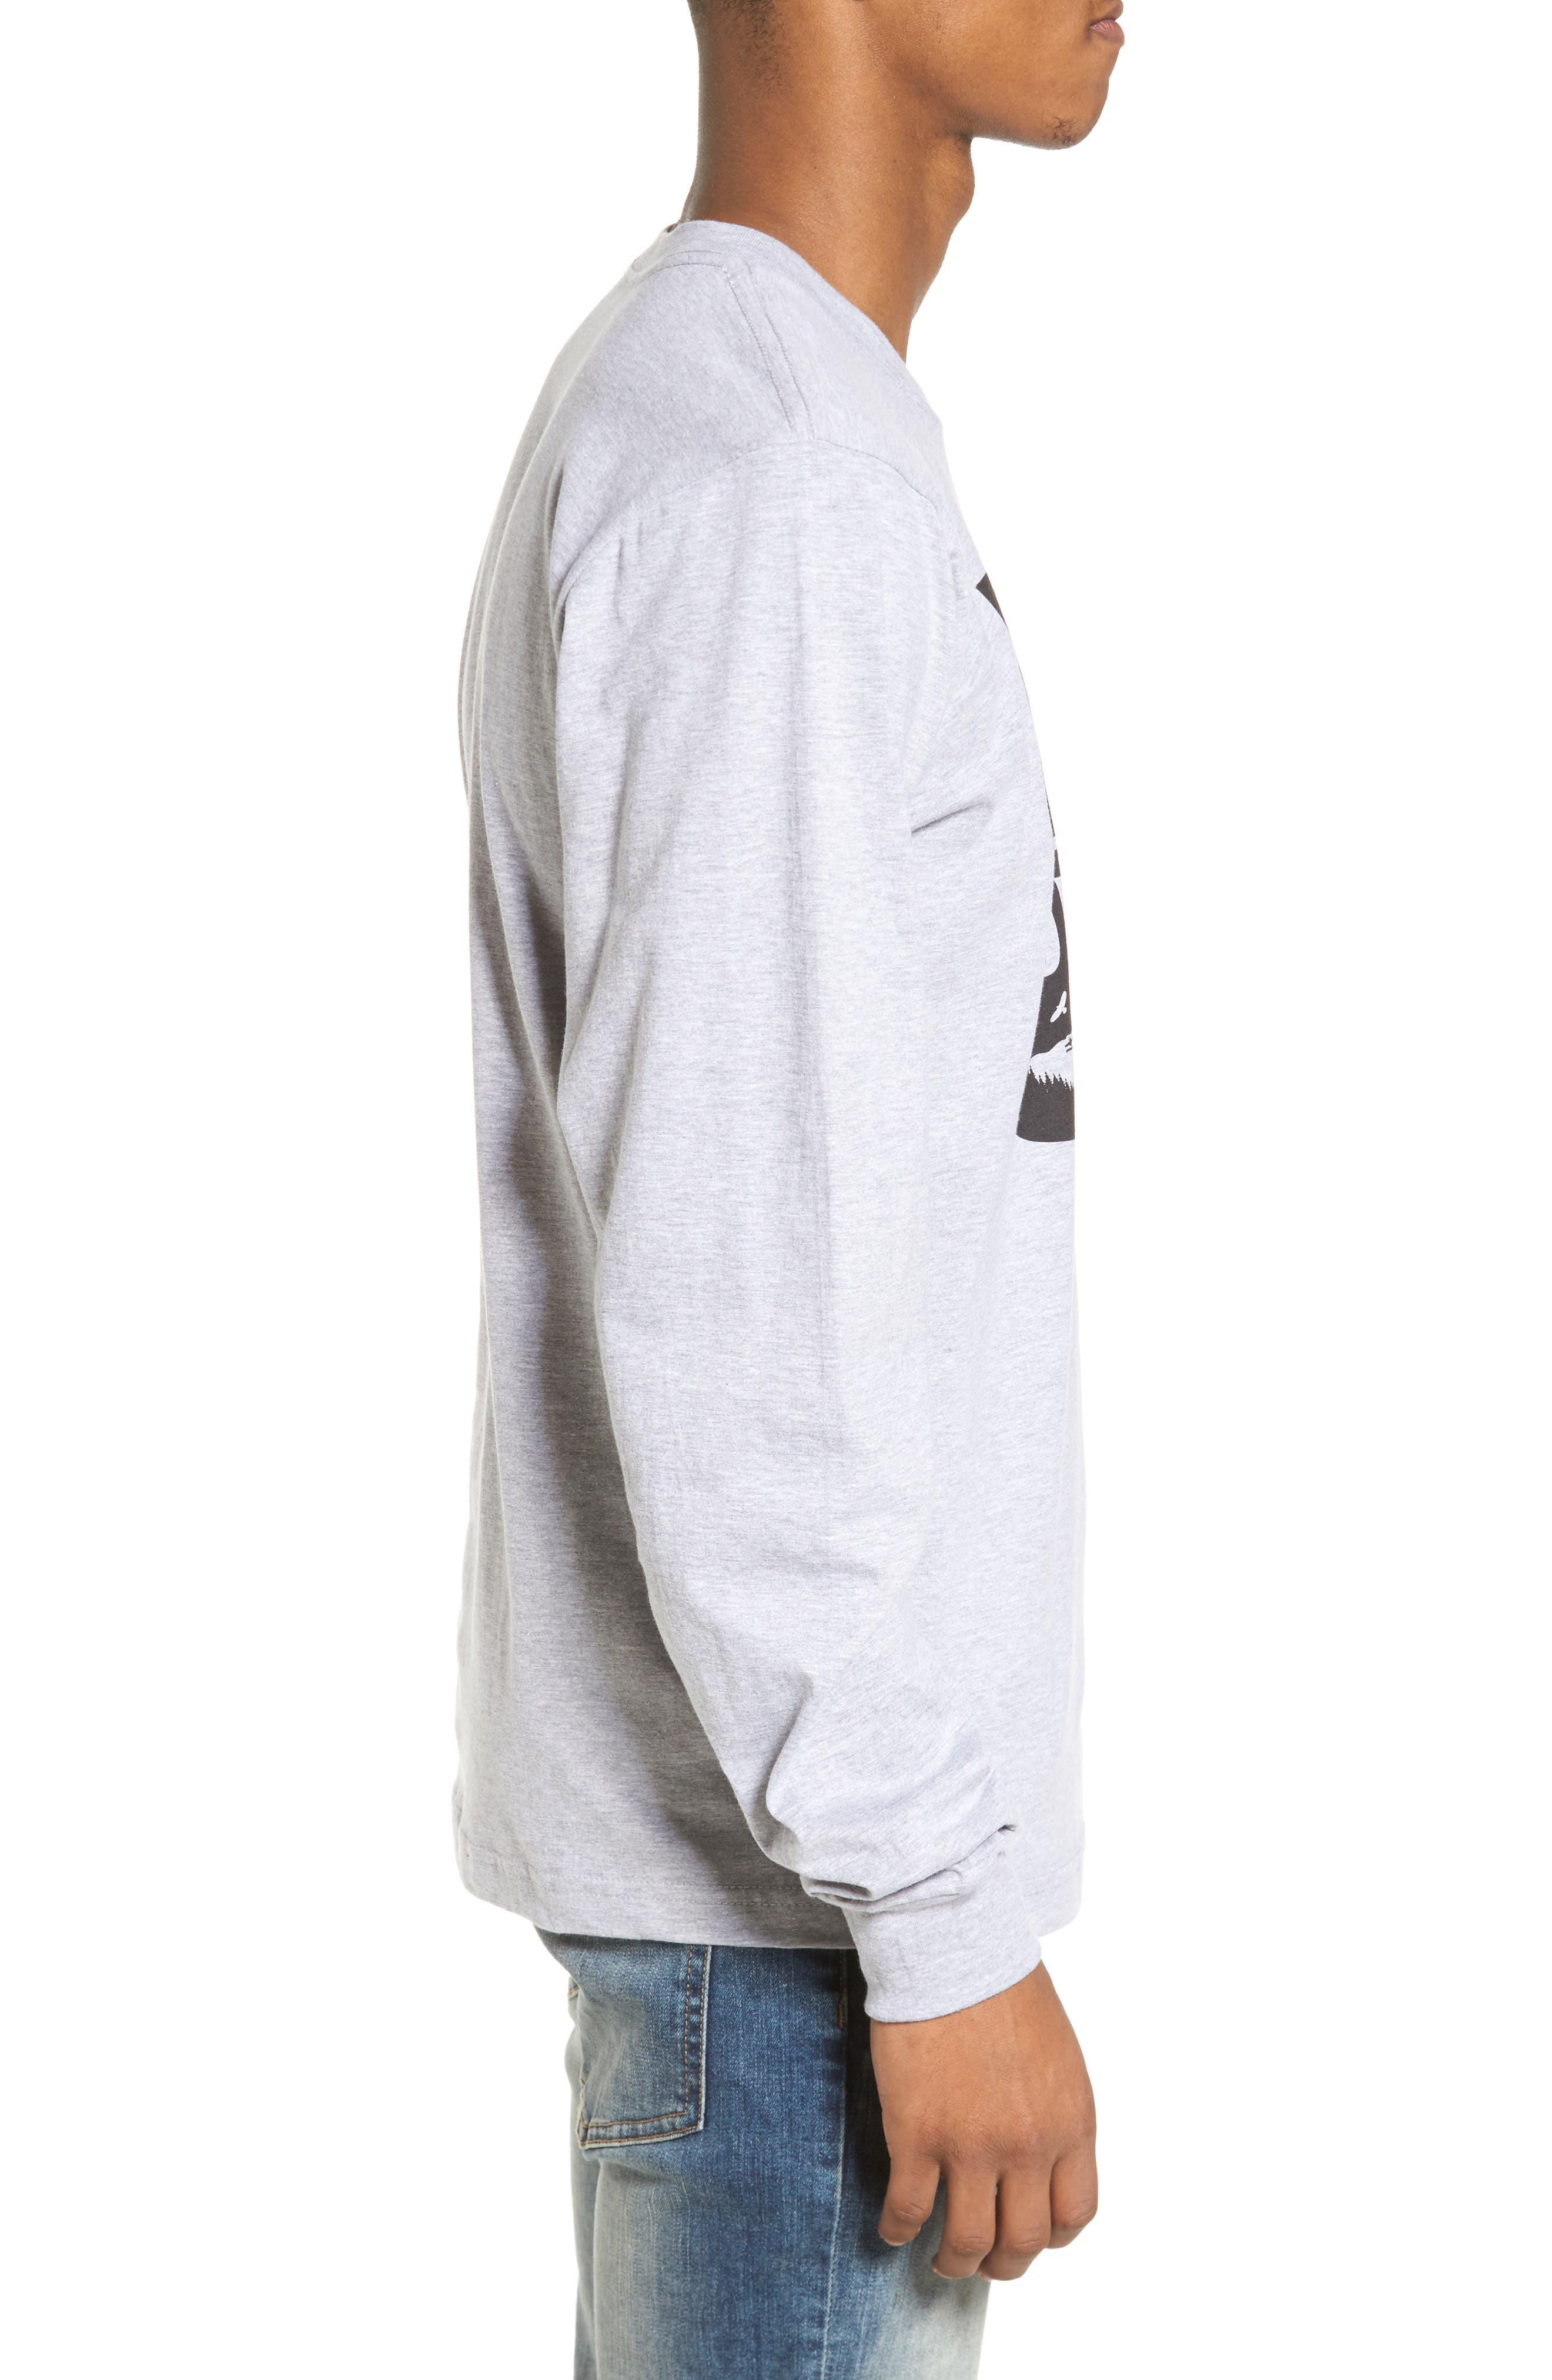 PNW Shield Sweatshirt,                             Alternate thumbnail 3, color,                             Heather Grey